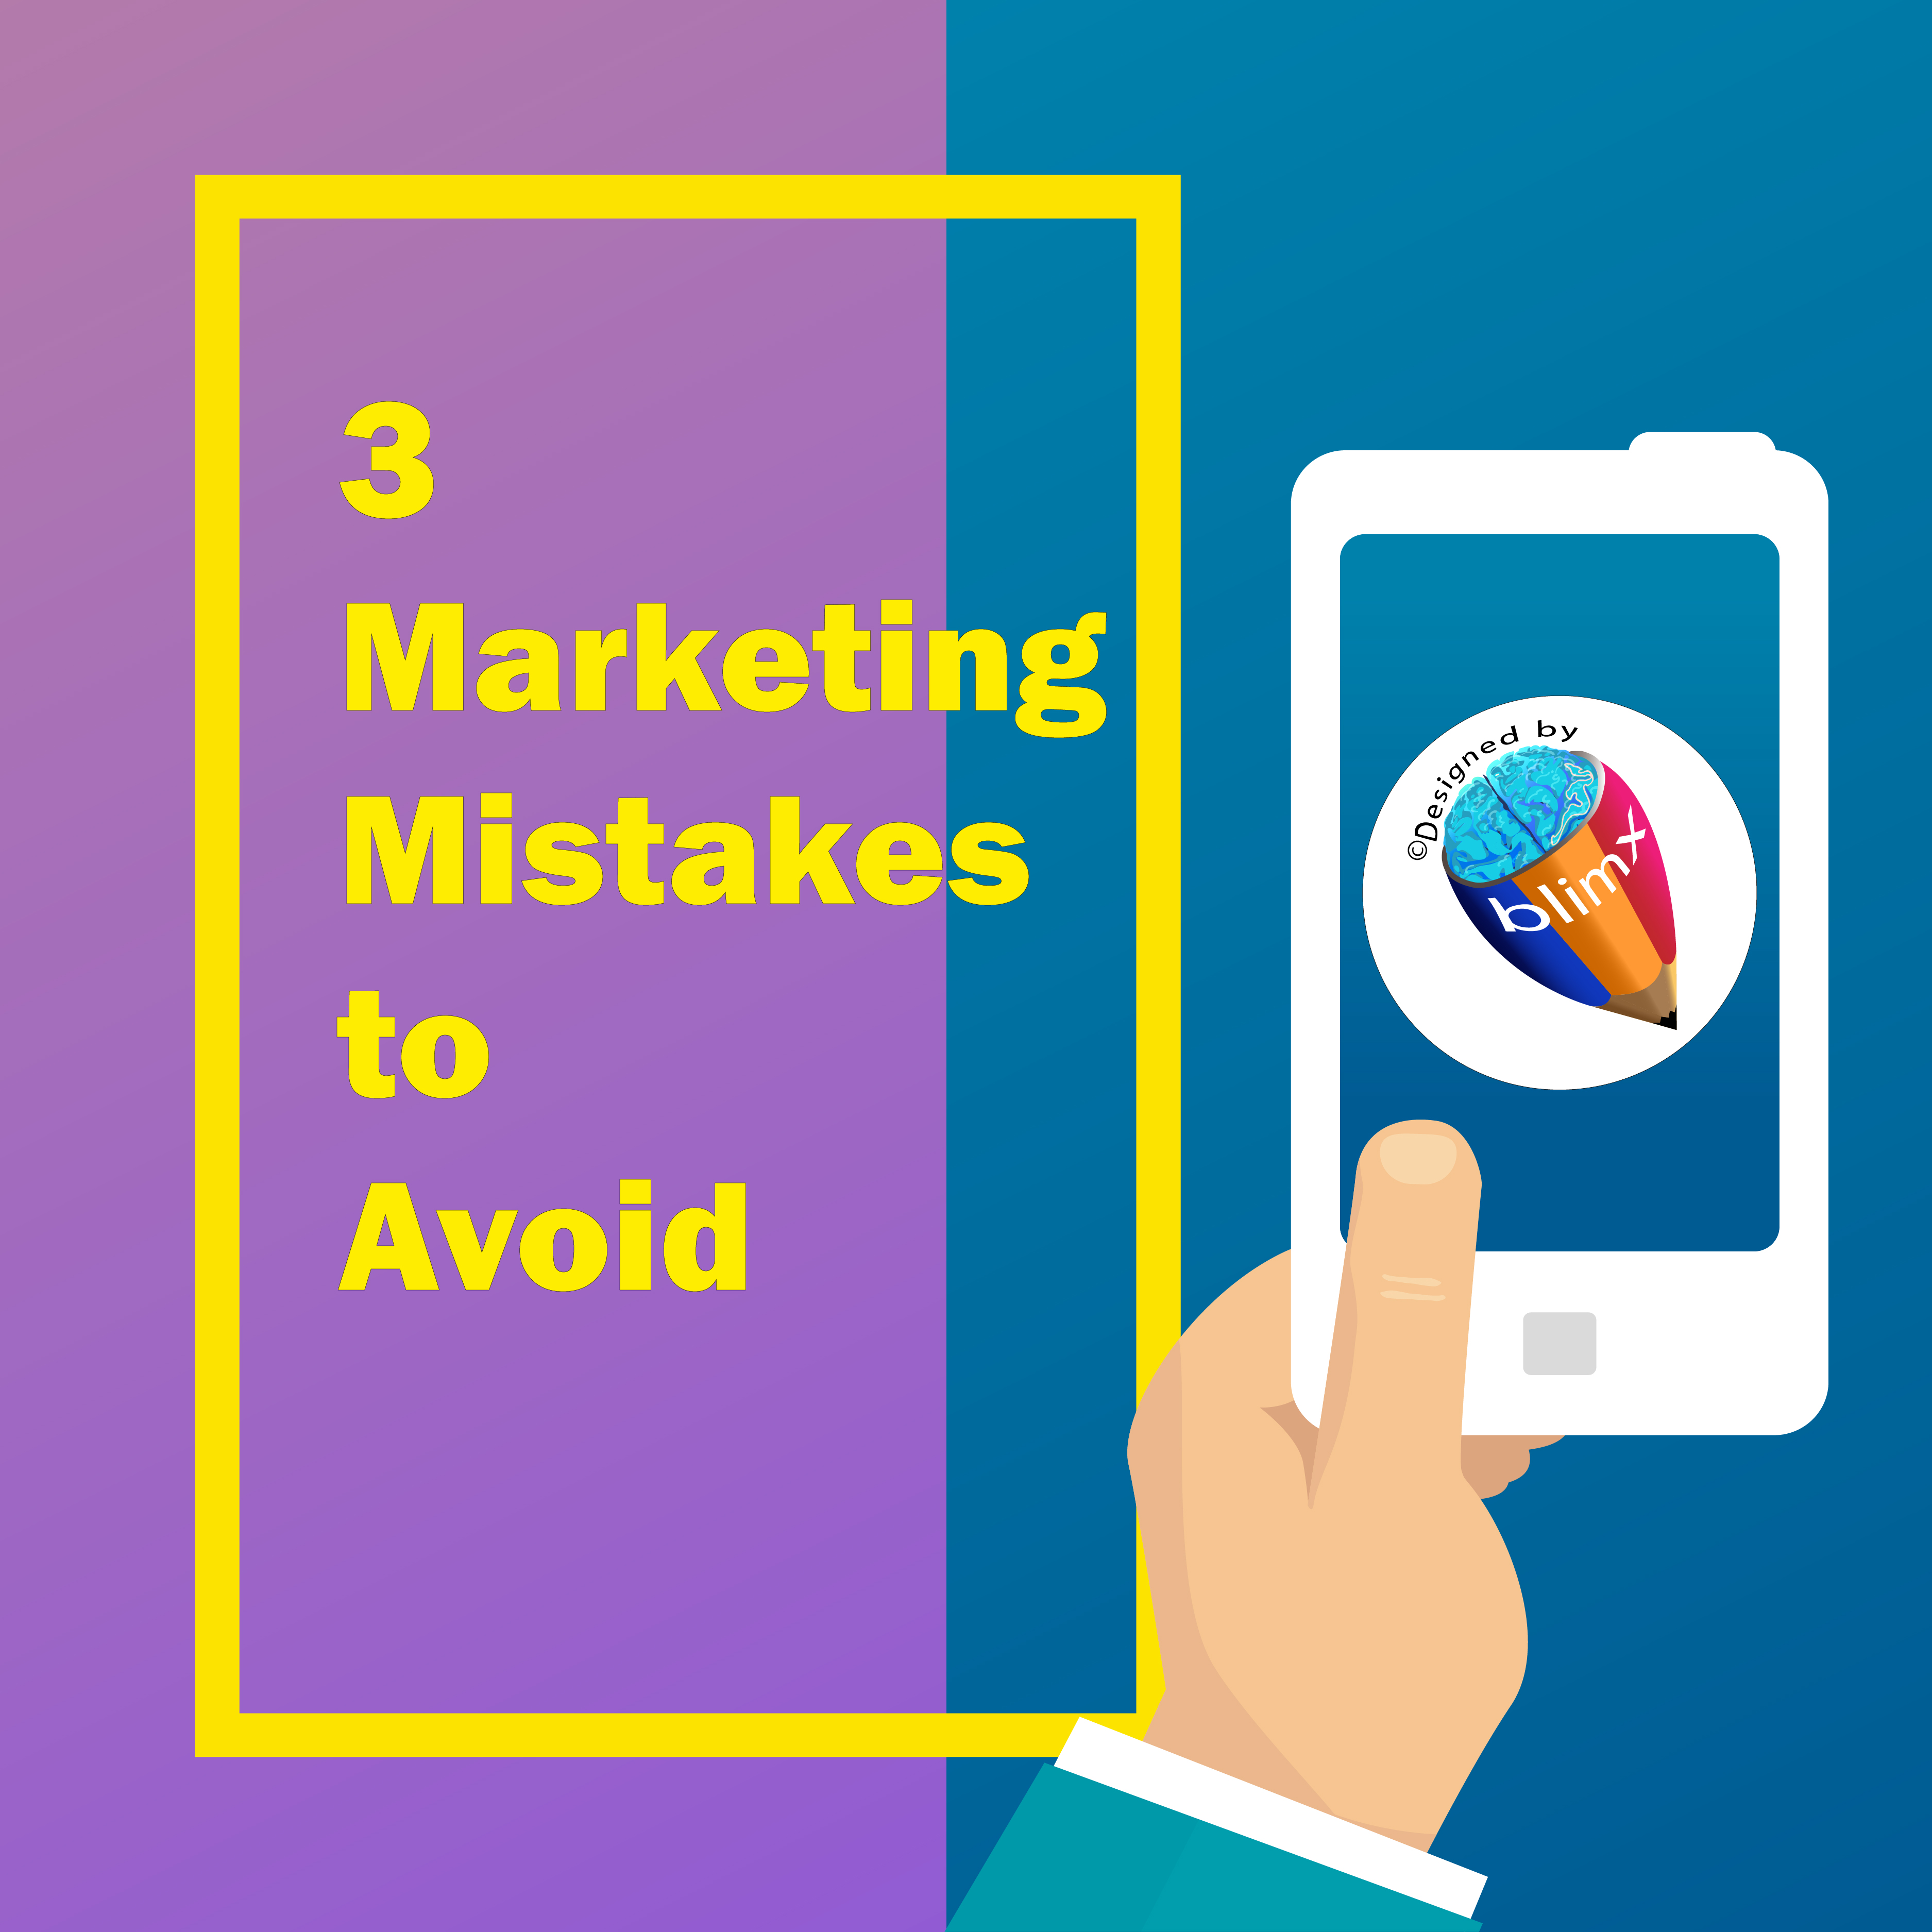 3 Marketing Mistakes to Avoid